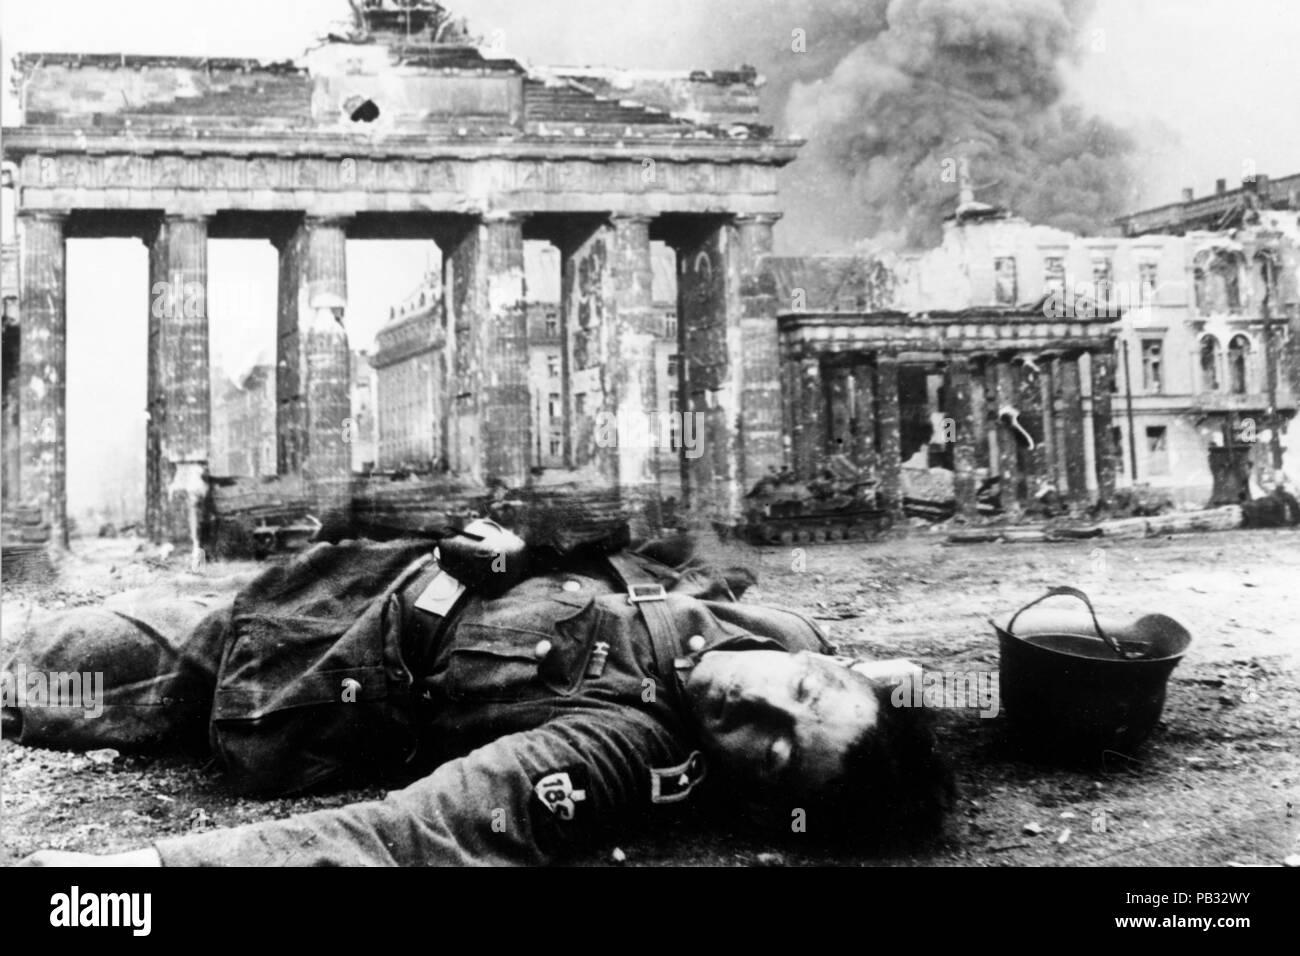 II world war, berlin, german soldier died - Stock Image